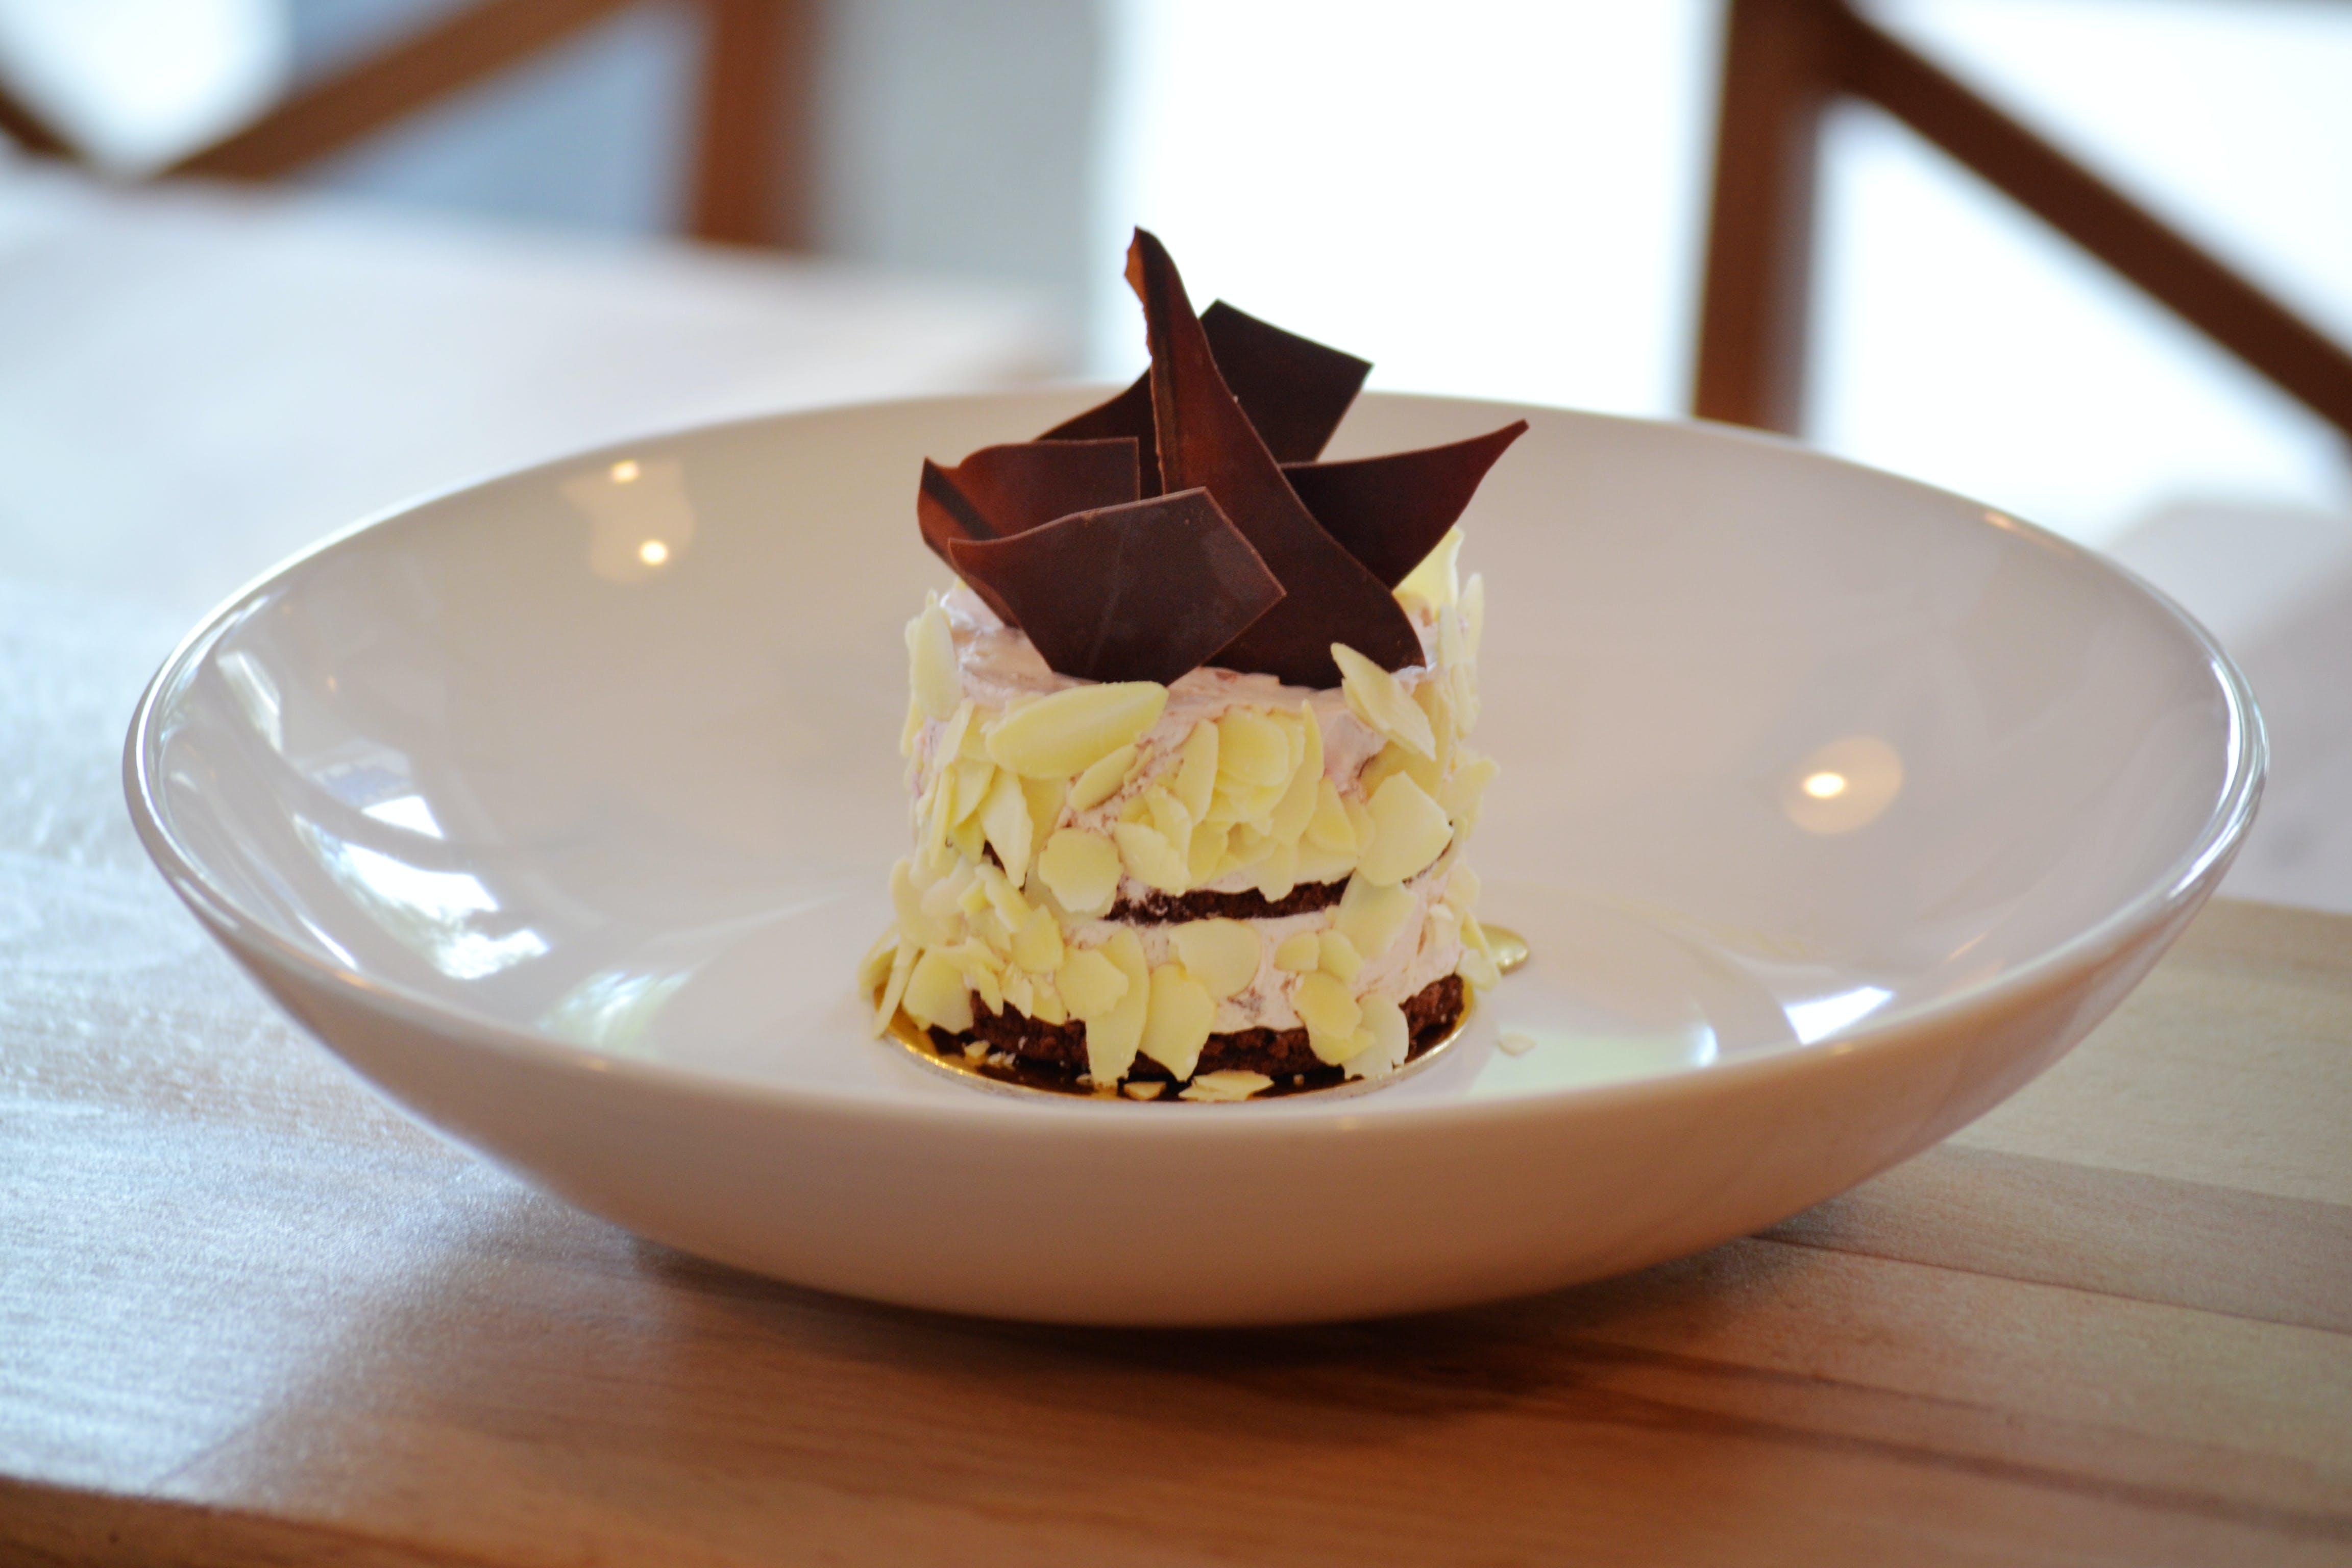 Free stock photo of food, plate, dark, brown